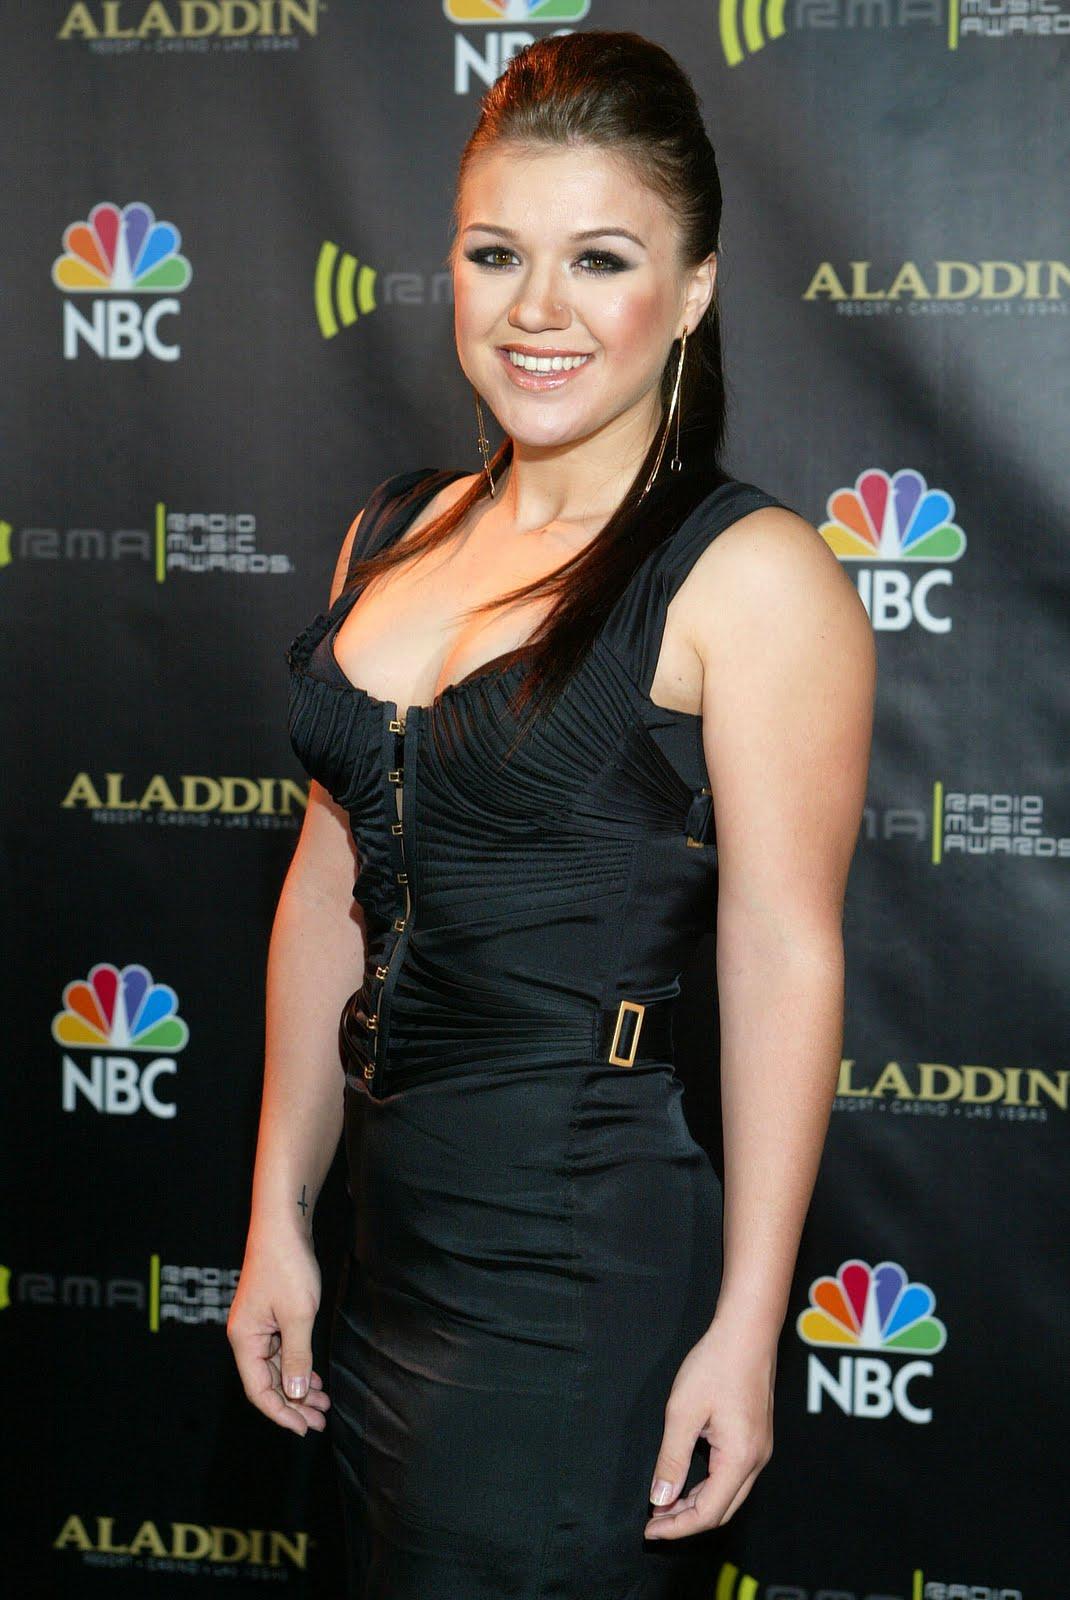 http://3.bp.blogspot.com/-t16wULGe1Pg/TlDg1hmdduI/AAAAAAAAABQ/2hFsSzLOsHs/s1600/Kelly-Clarkson-life-style-2011-american-singer-and-actress-15.jpg